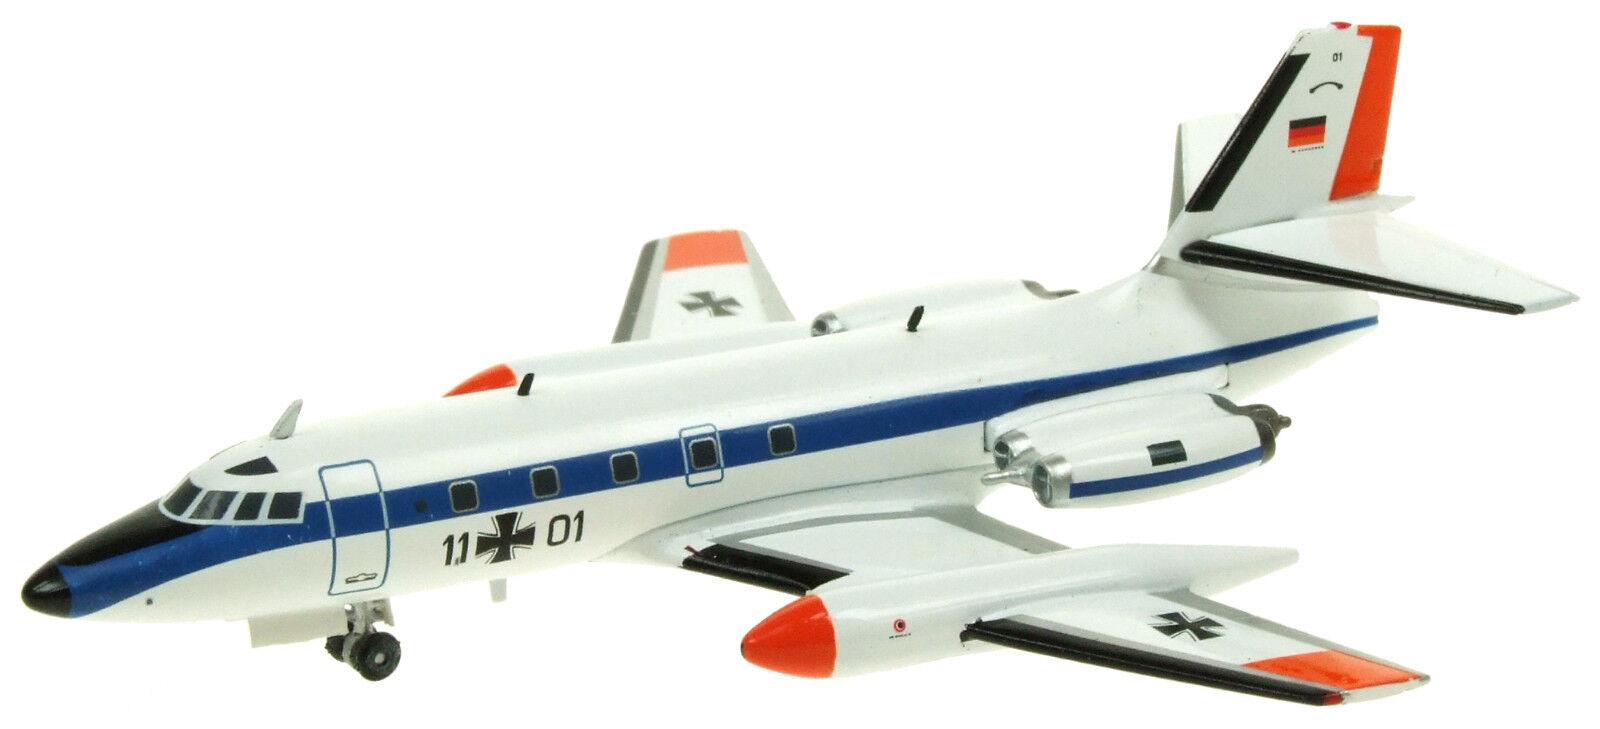 Inflight 200 IF1400716 1/200 Tedesco Aeronautica C-140b Jetstar  L-1329  11+01 W